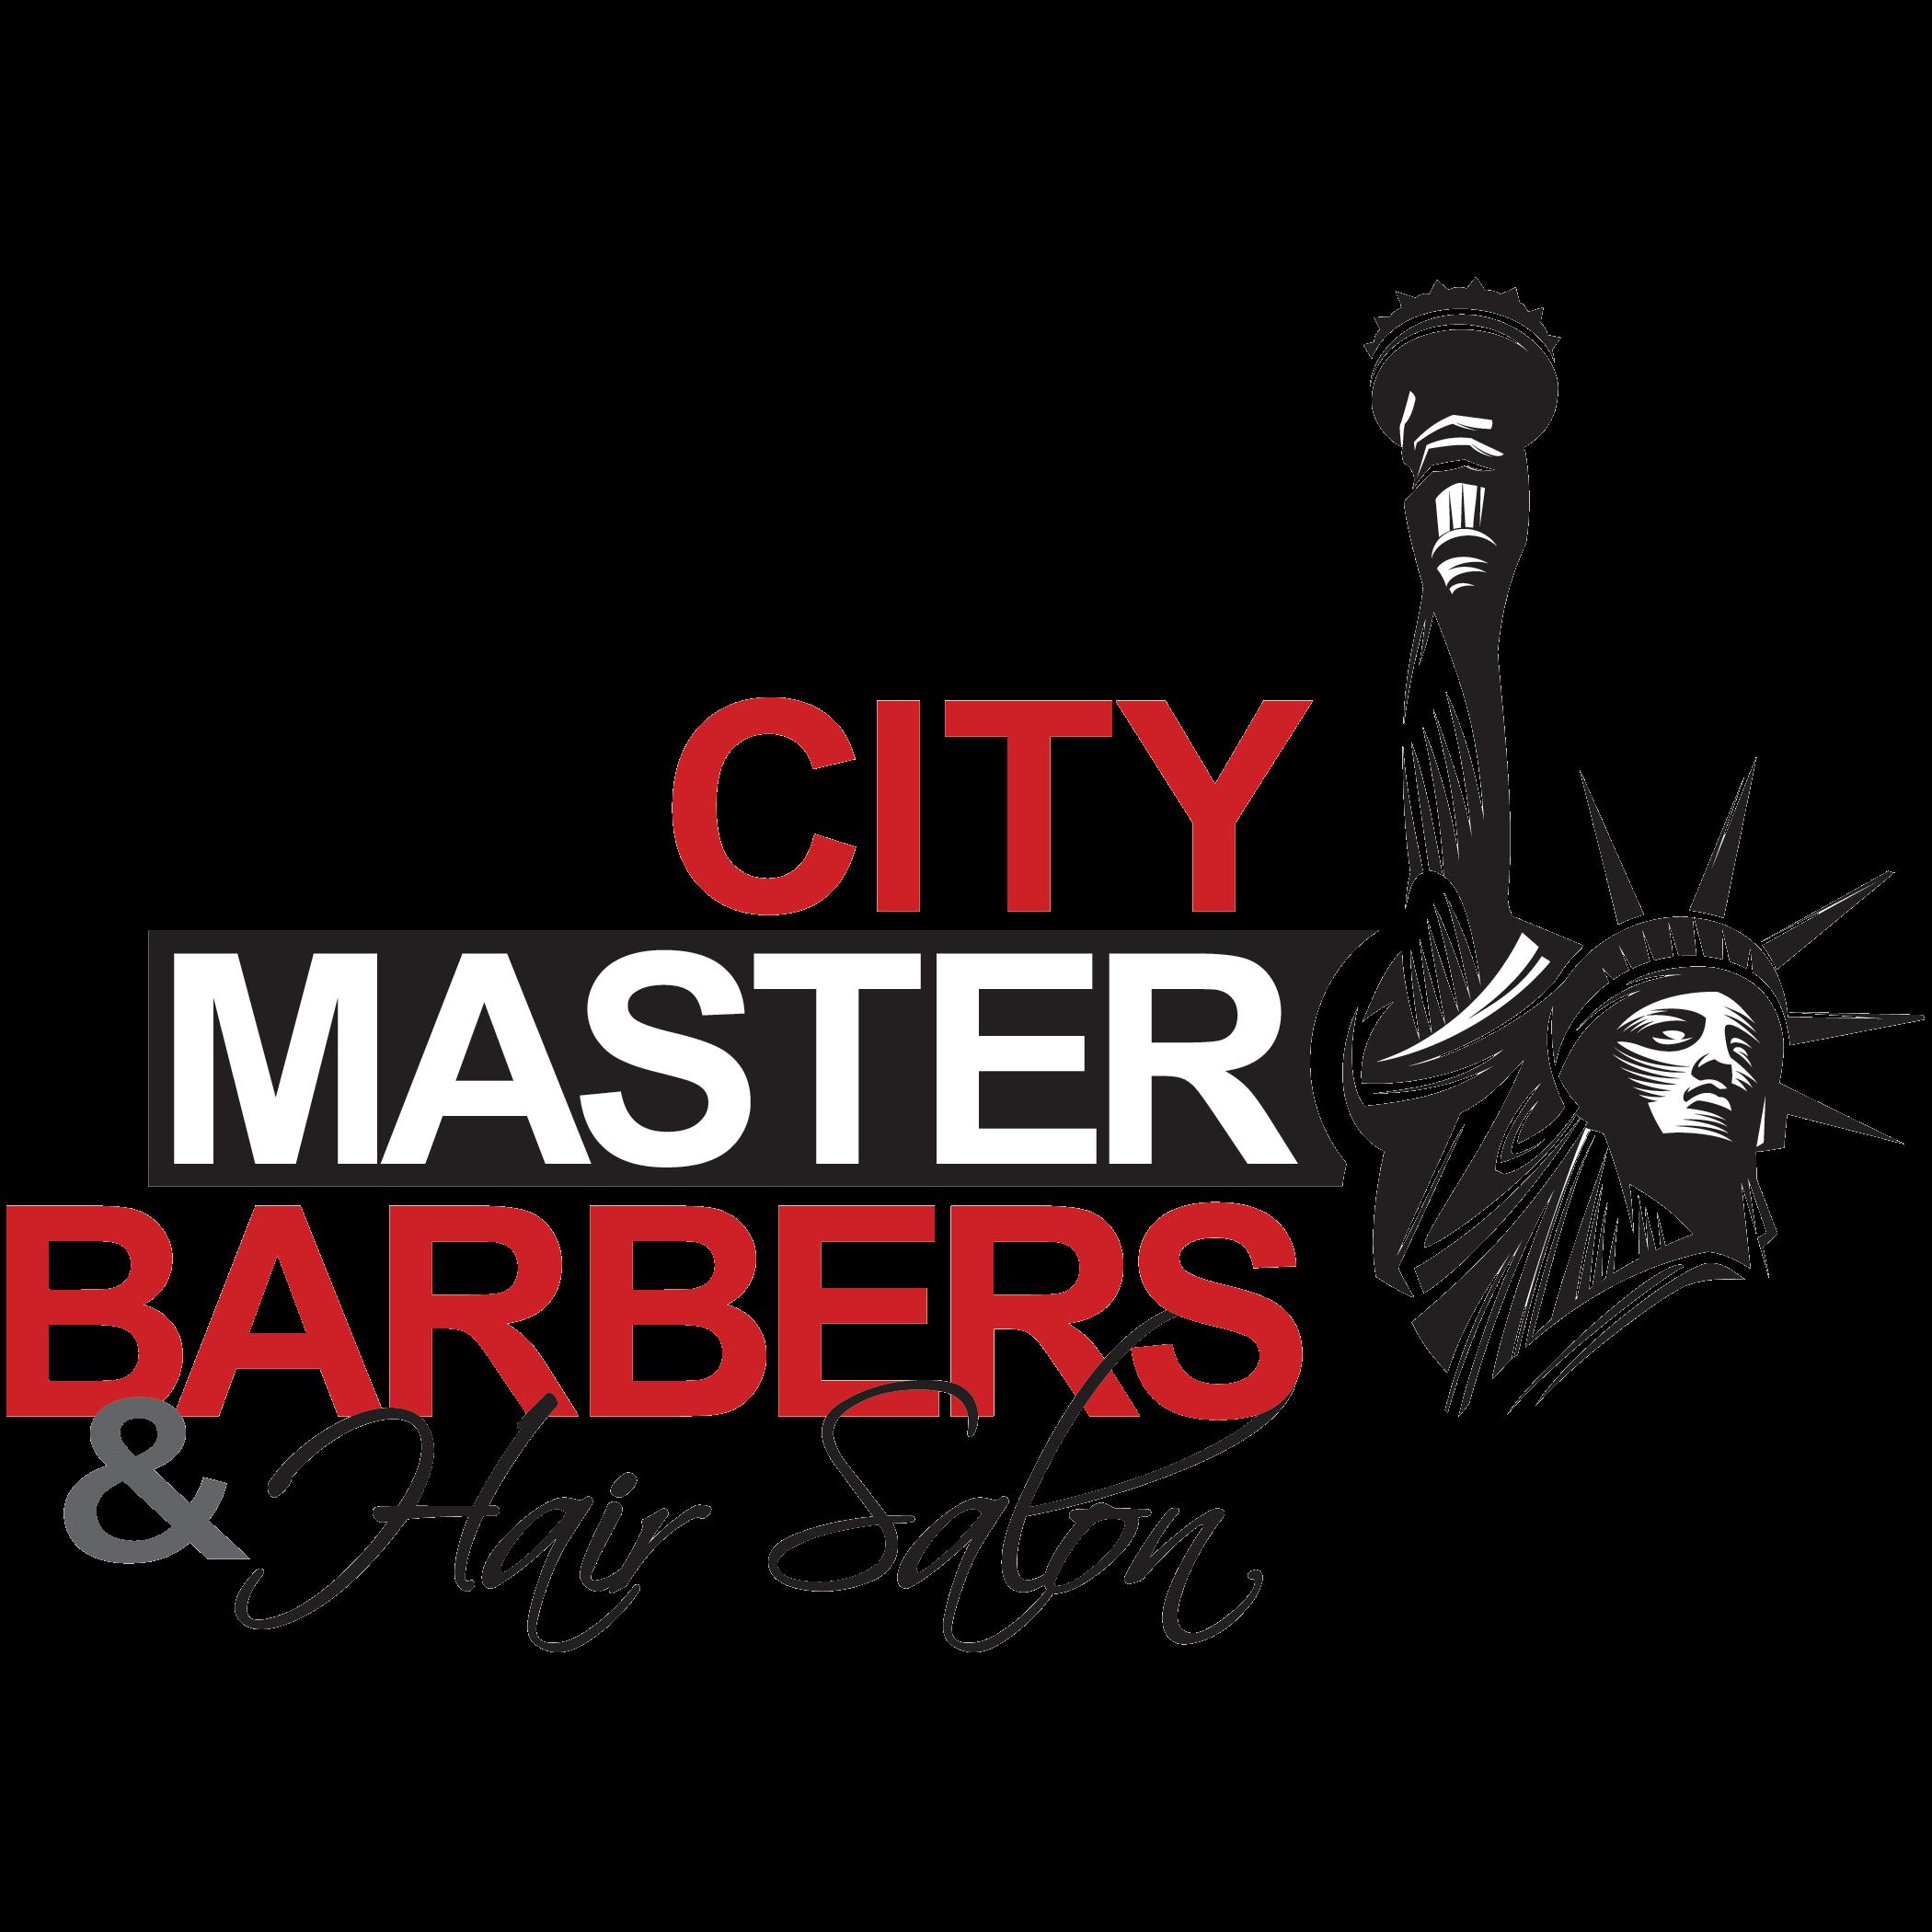 City Master Barbers & Hair Salon